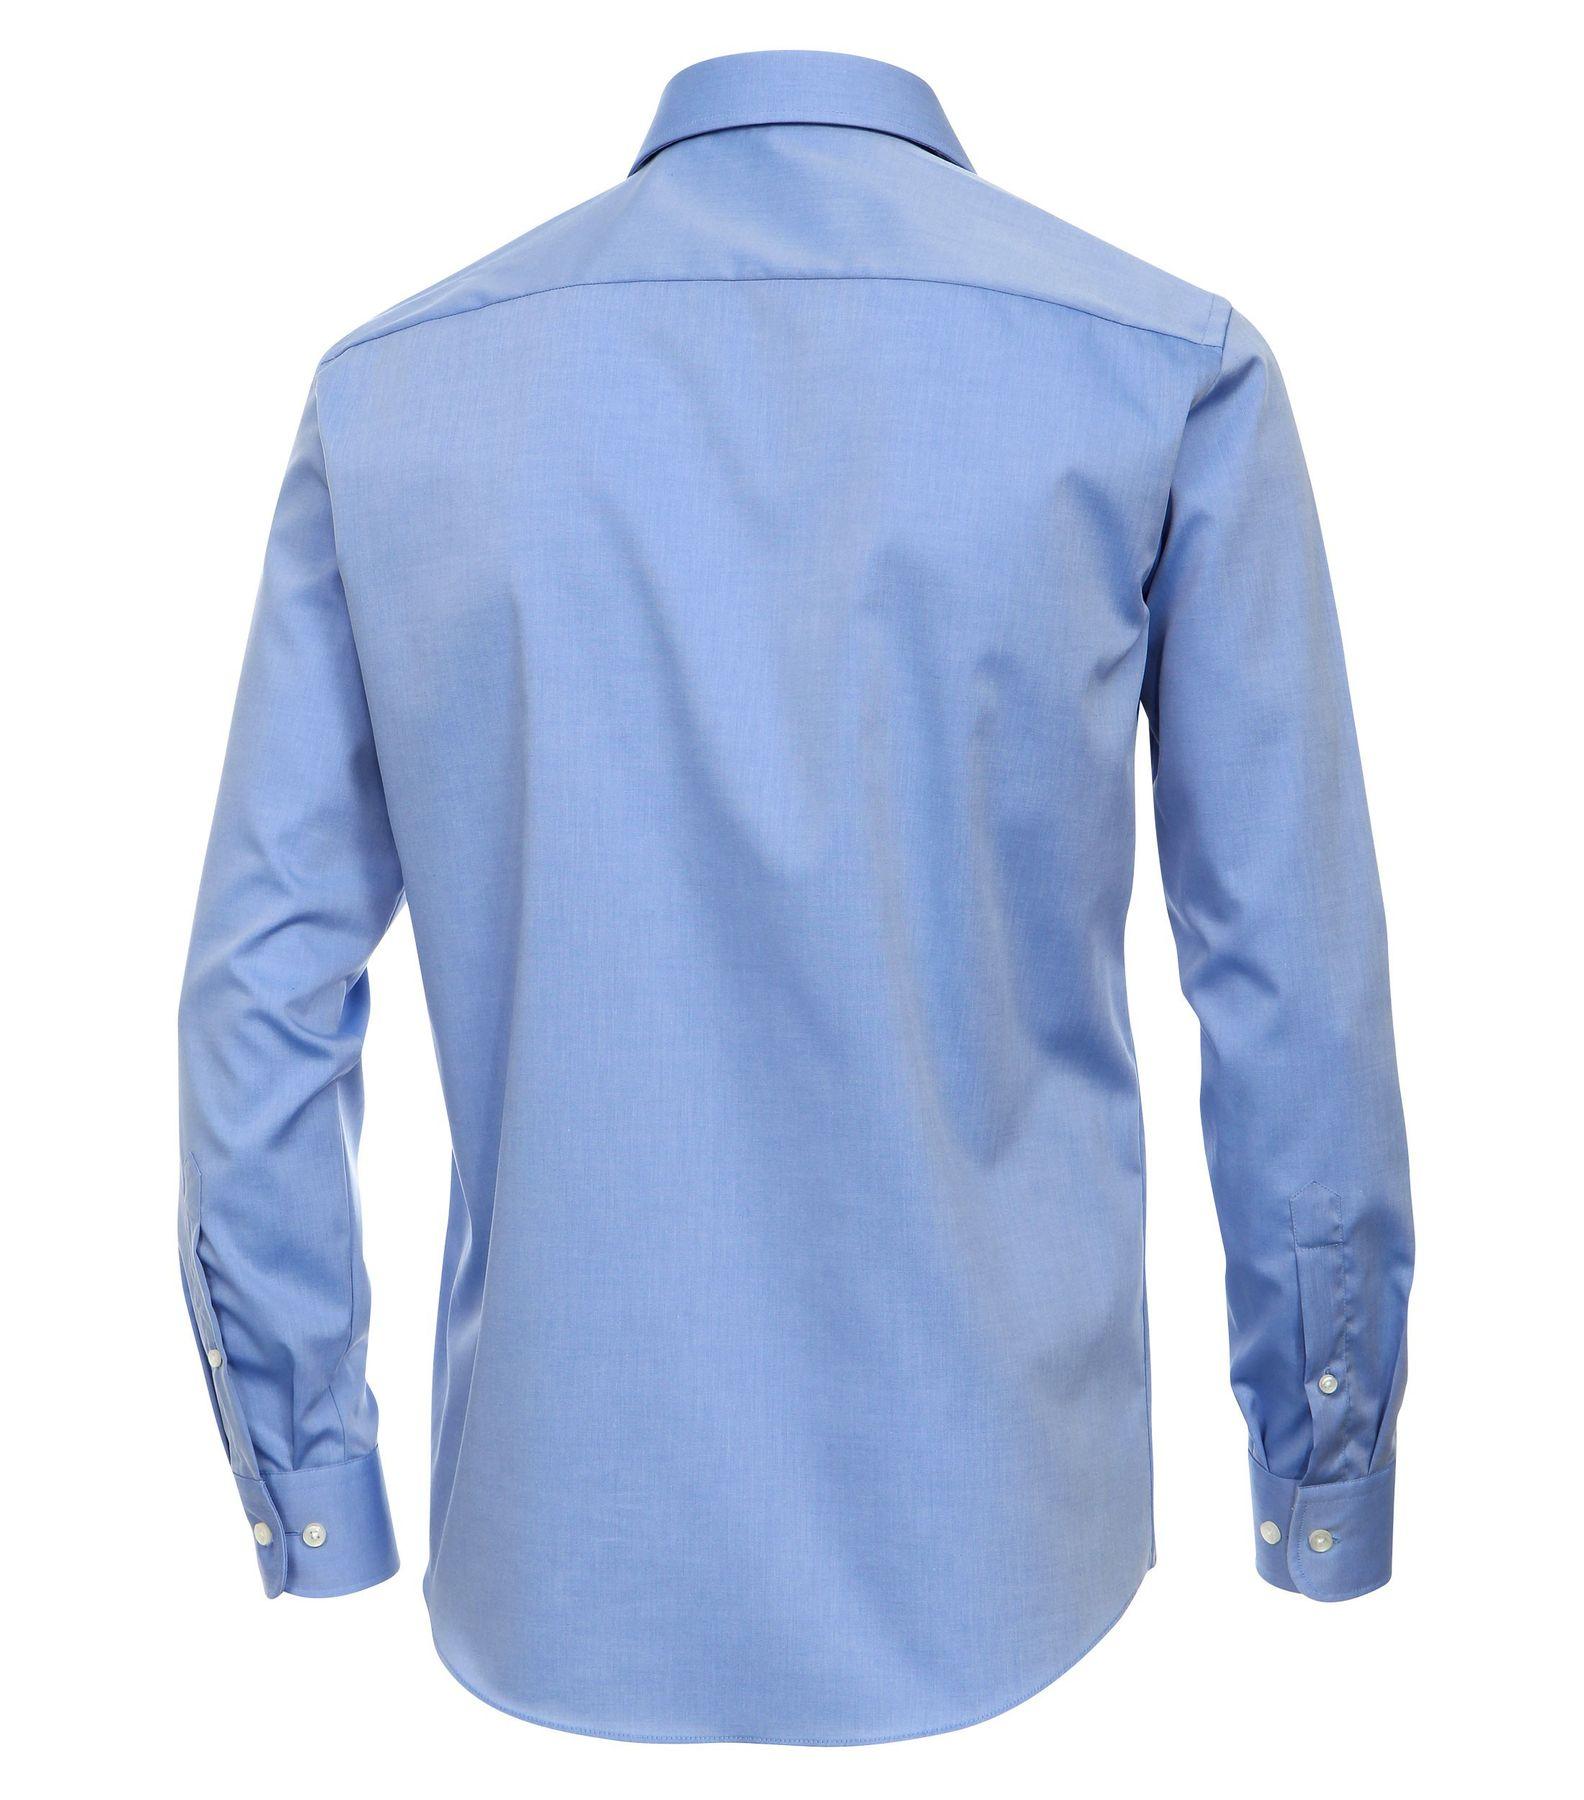 Casamoda - Modern Fit - Bügelfreies Herren Business Langarm Hemd verschiedene Farben (006560A) – Bild 14